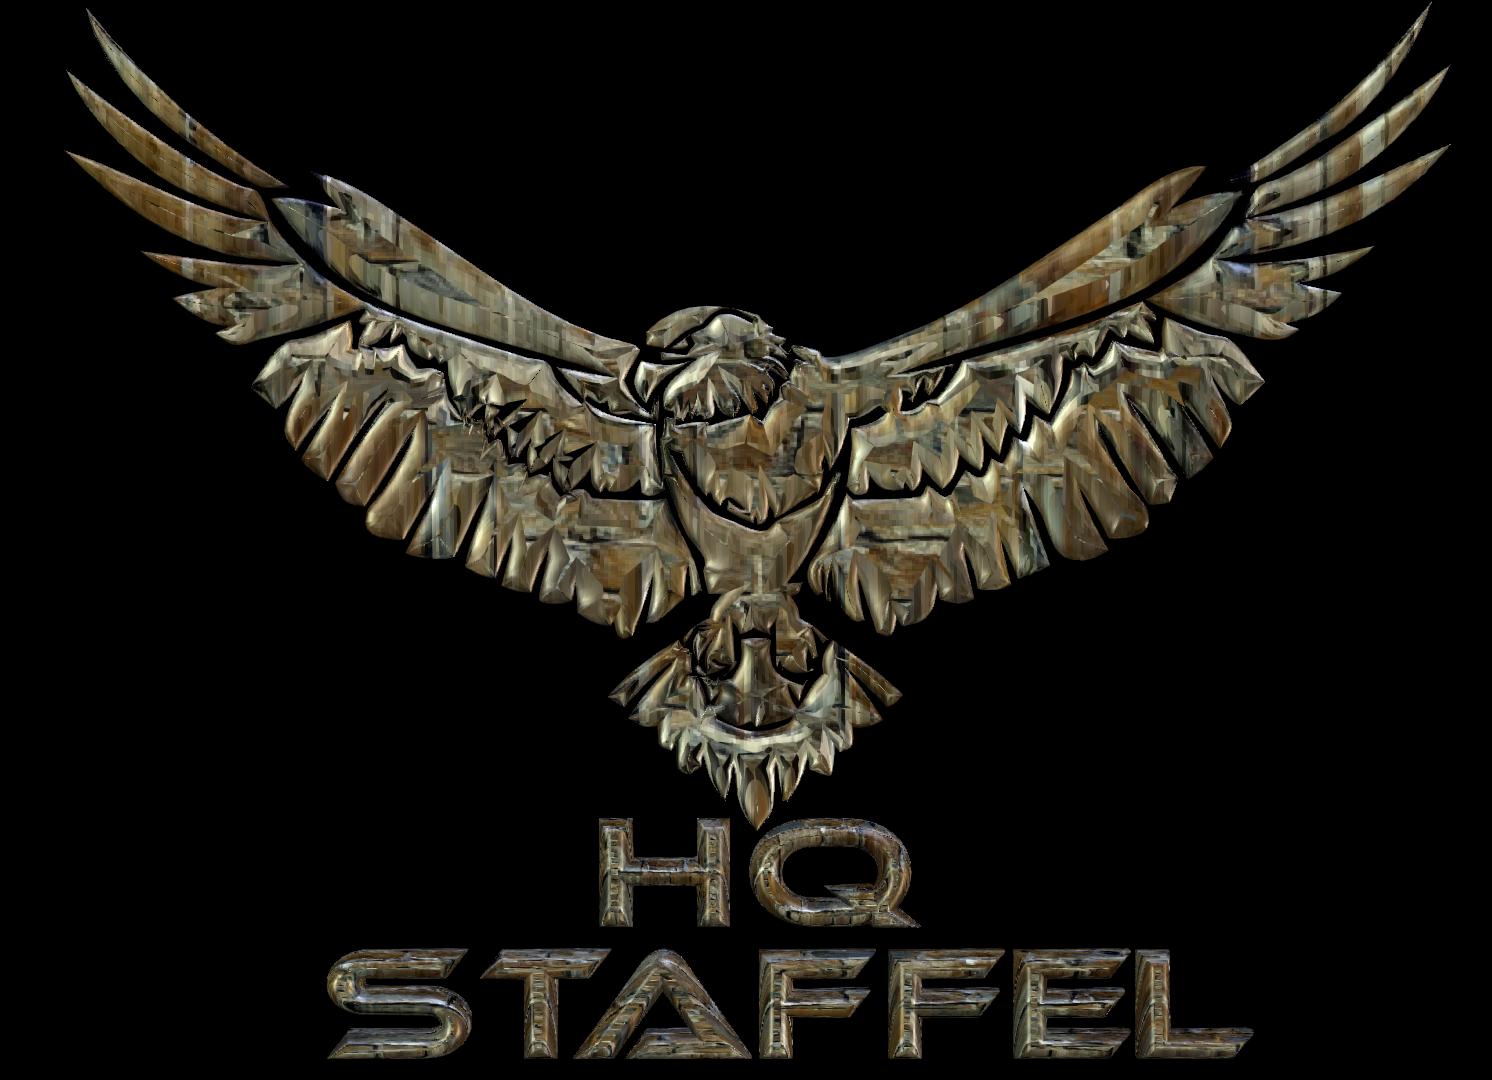 HQ-Staffel-Logo_Adler_02_Stein_01.png